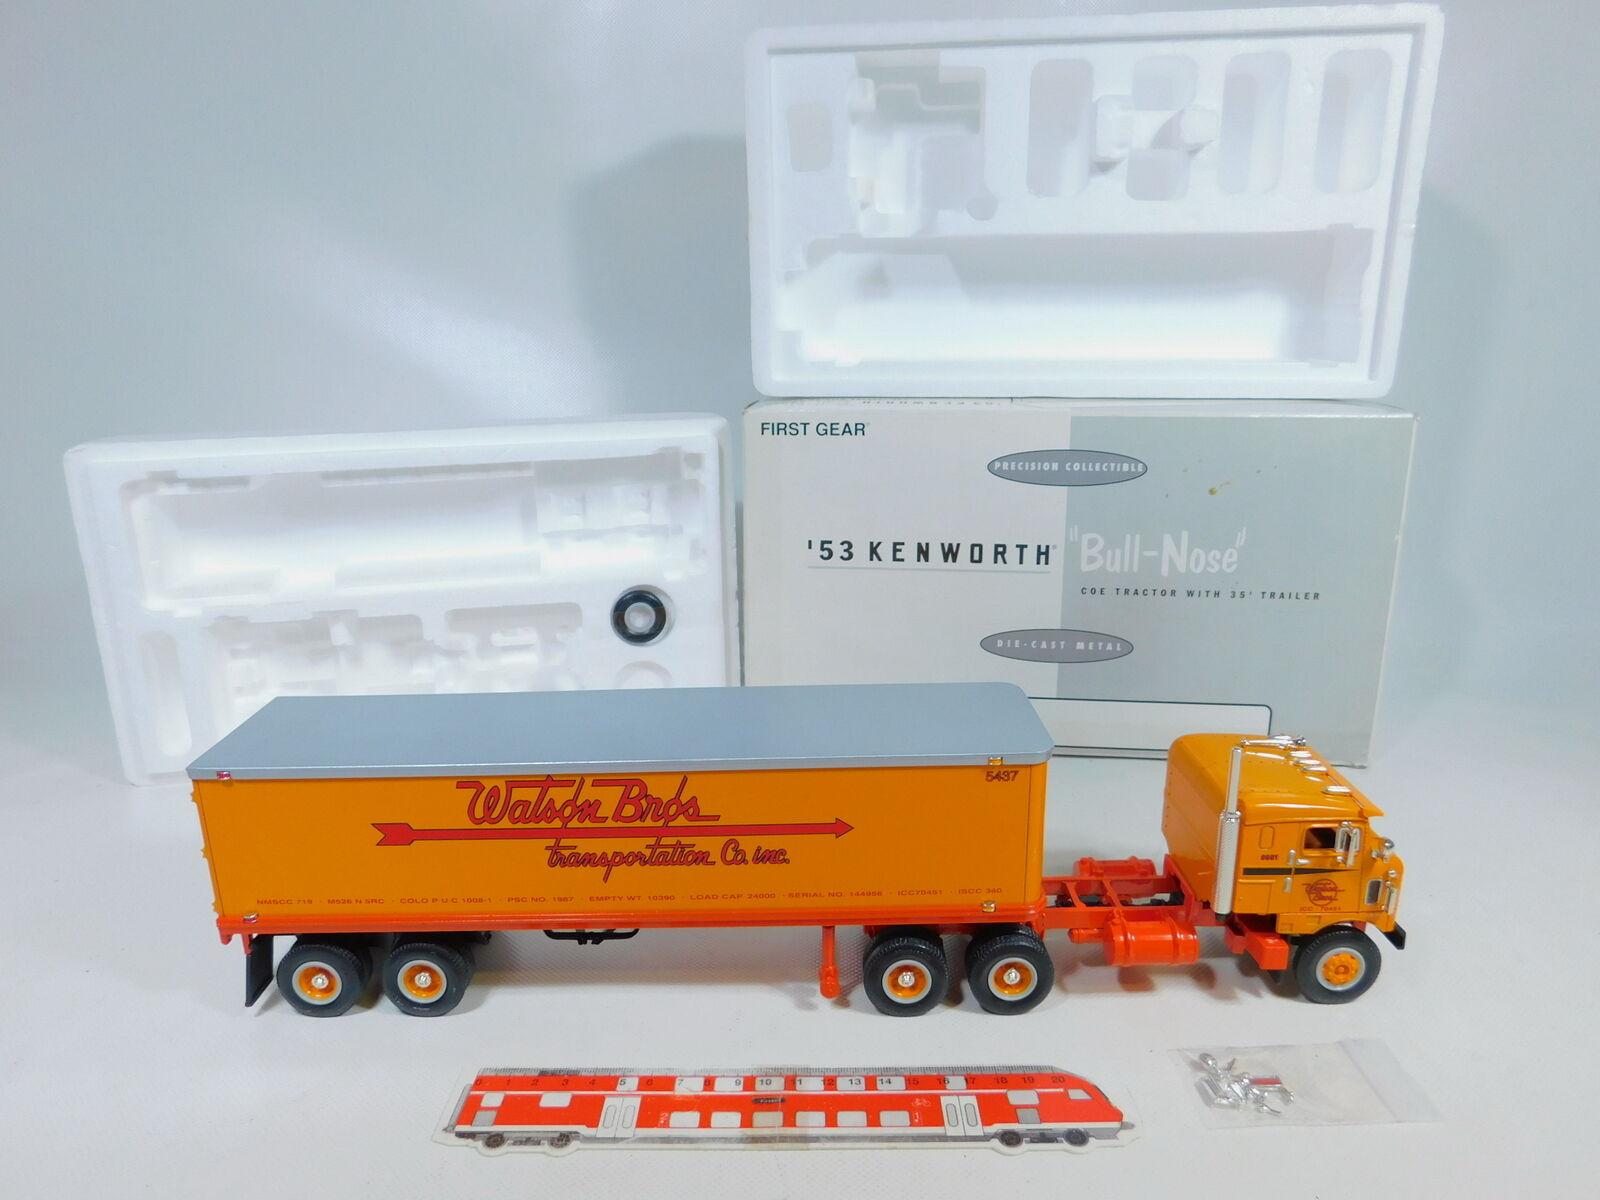 Ca62-3  First Gear 1 34 19-1731 camions'53  KENWORTH Bull Nose Watson Bros, Neuw + neuf dans sa boîte  Commandez maintenant